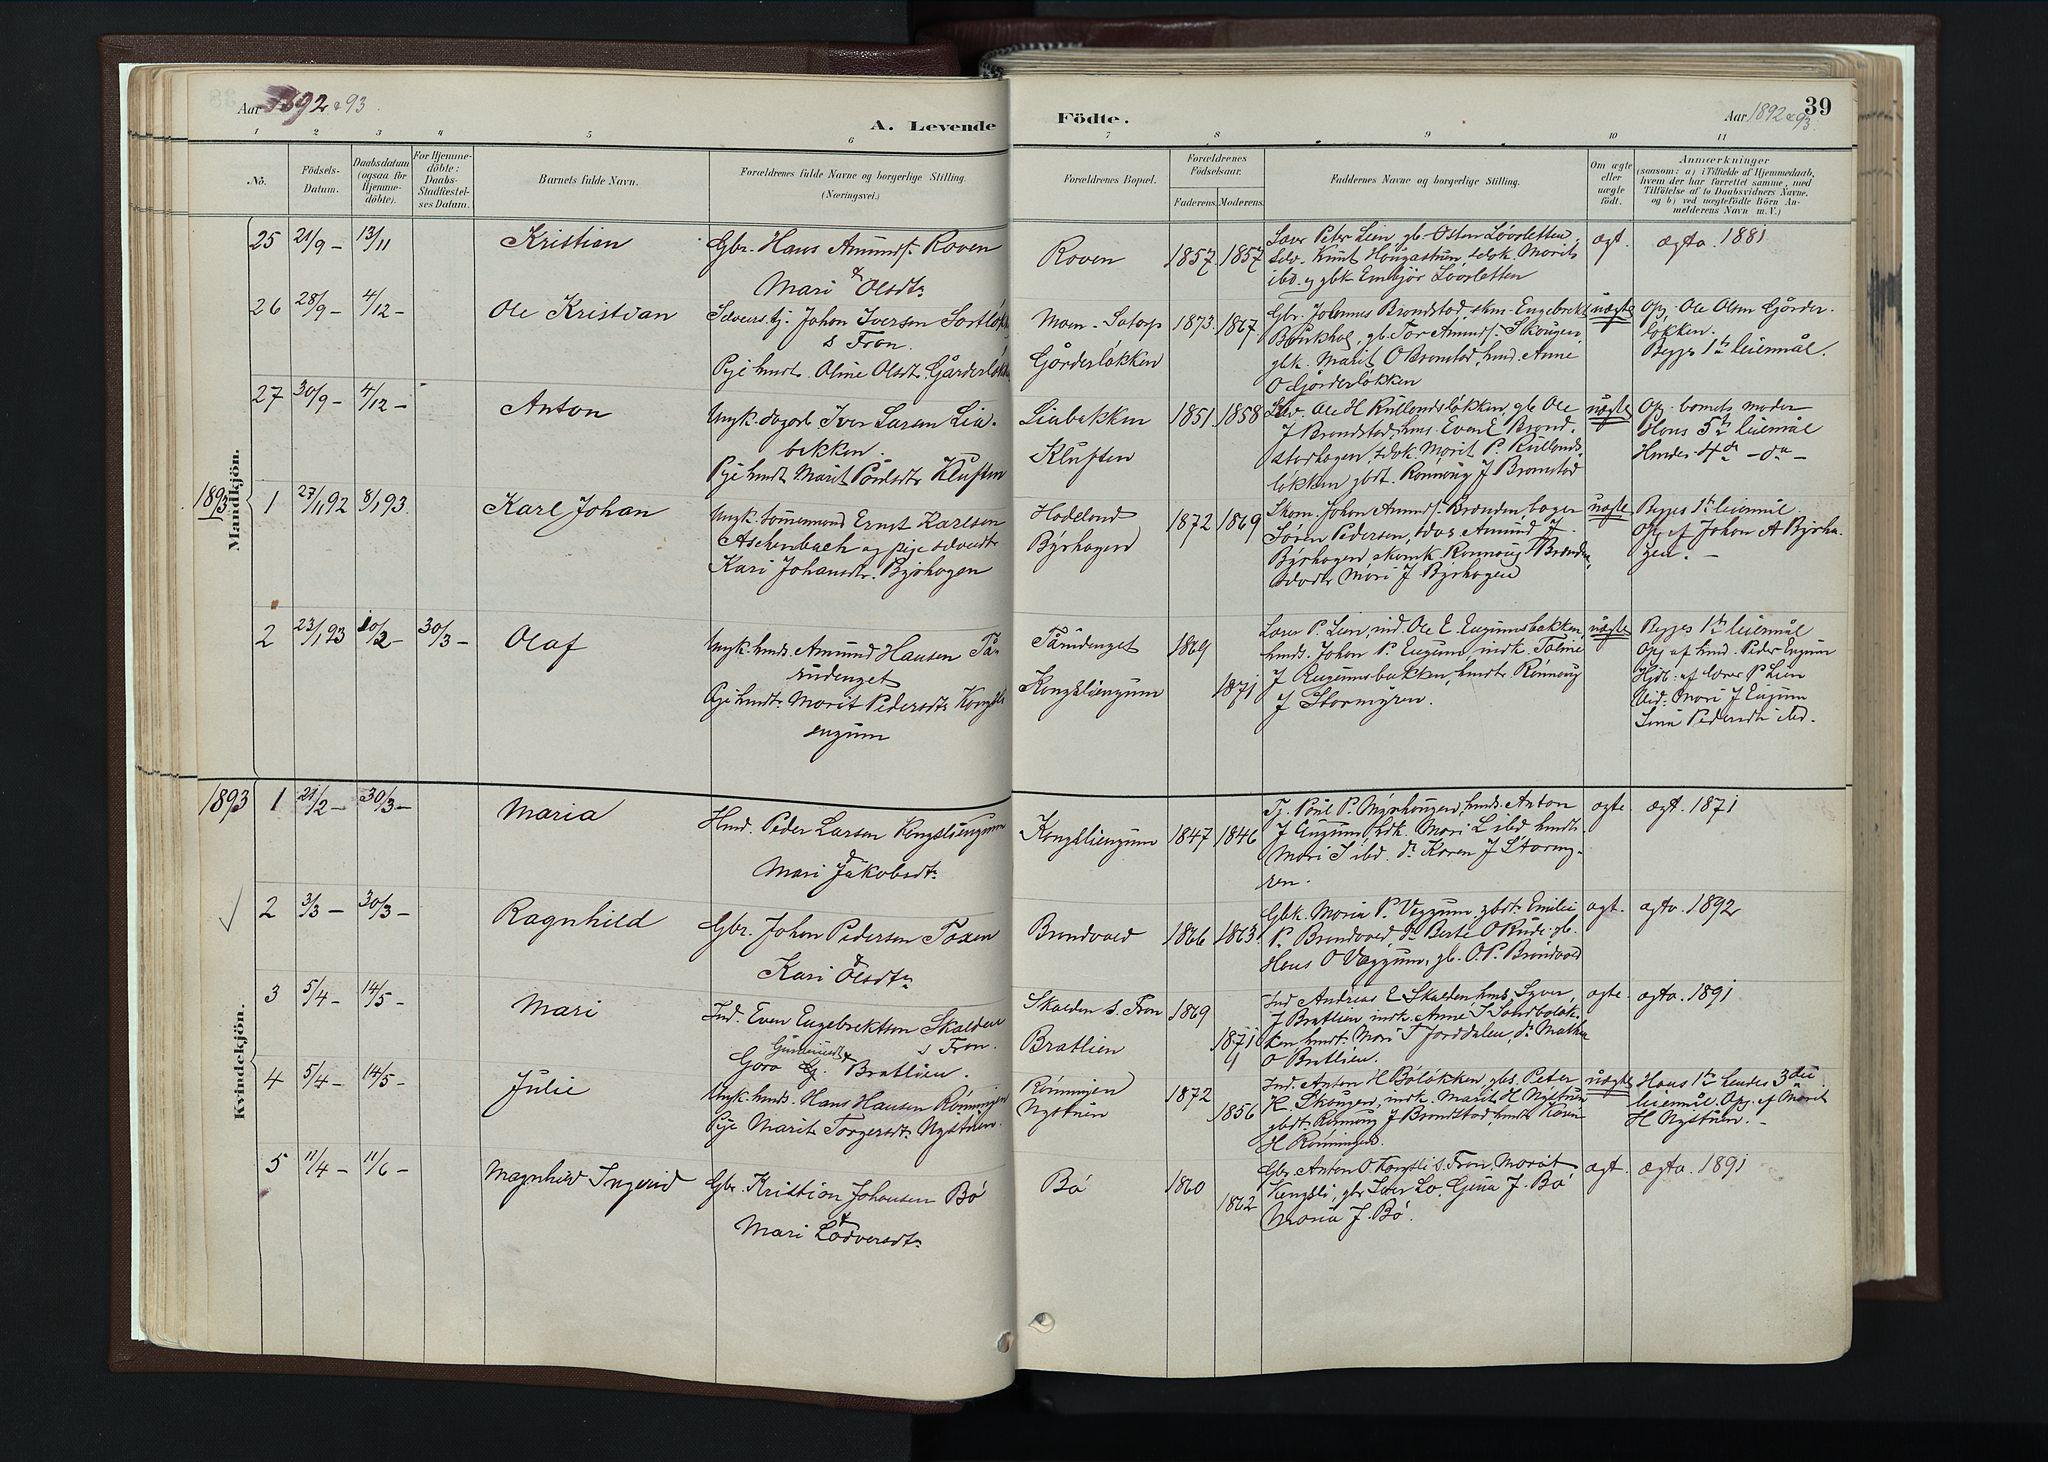 SAH, Nord-Fron prestekontor, Ministerialbok nr. 4, 1884-1914, s. 39